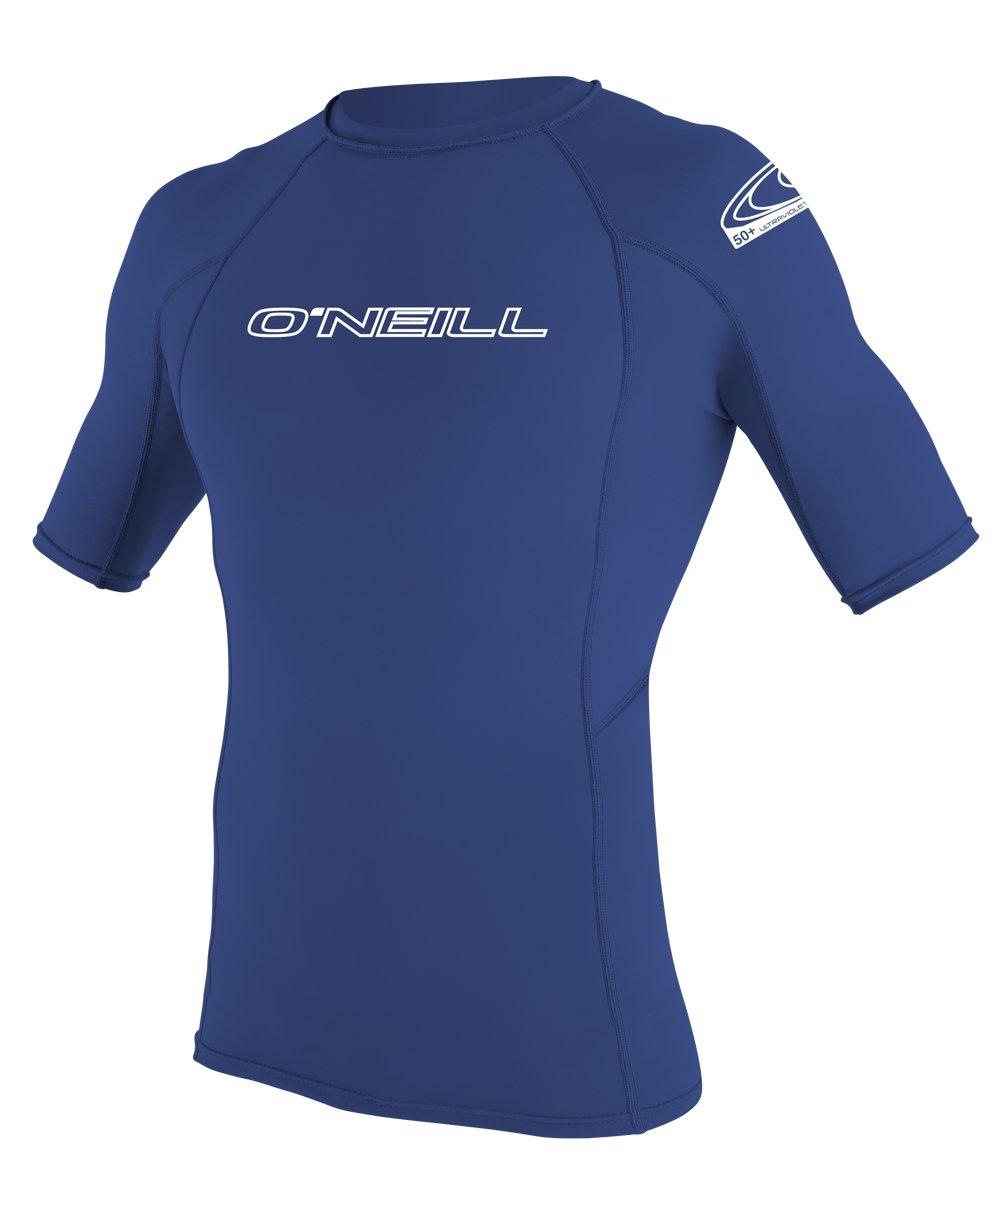 O'Neill Wetsuits Men's Basic Skins UPF 50+ Short Sleeve Rash Guard, Pacific, Medium